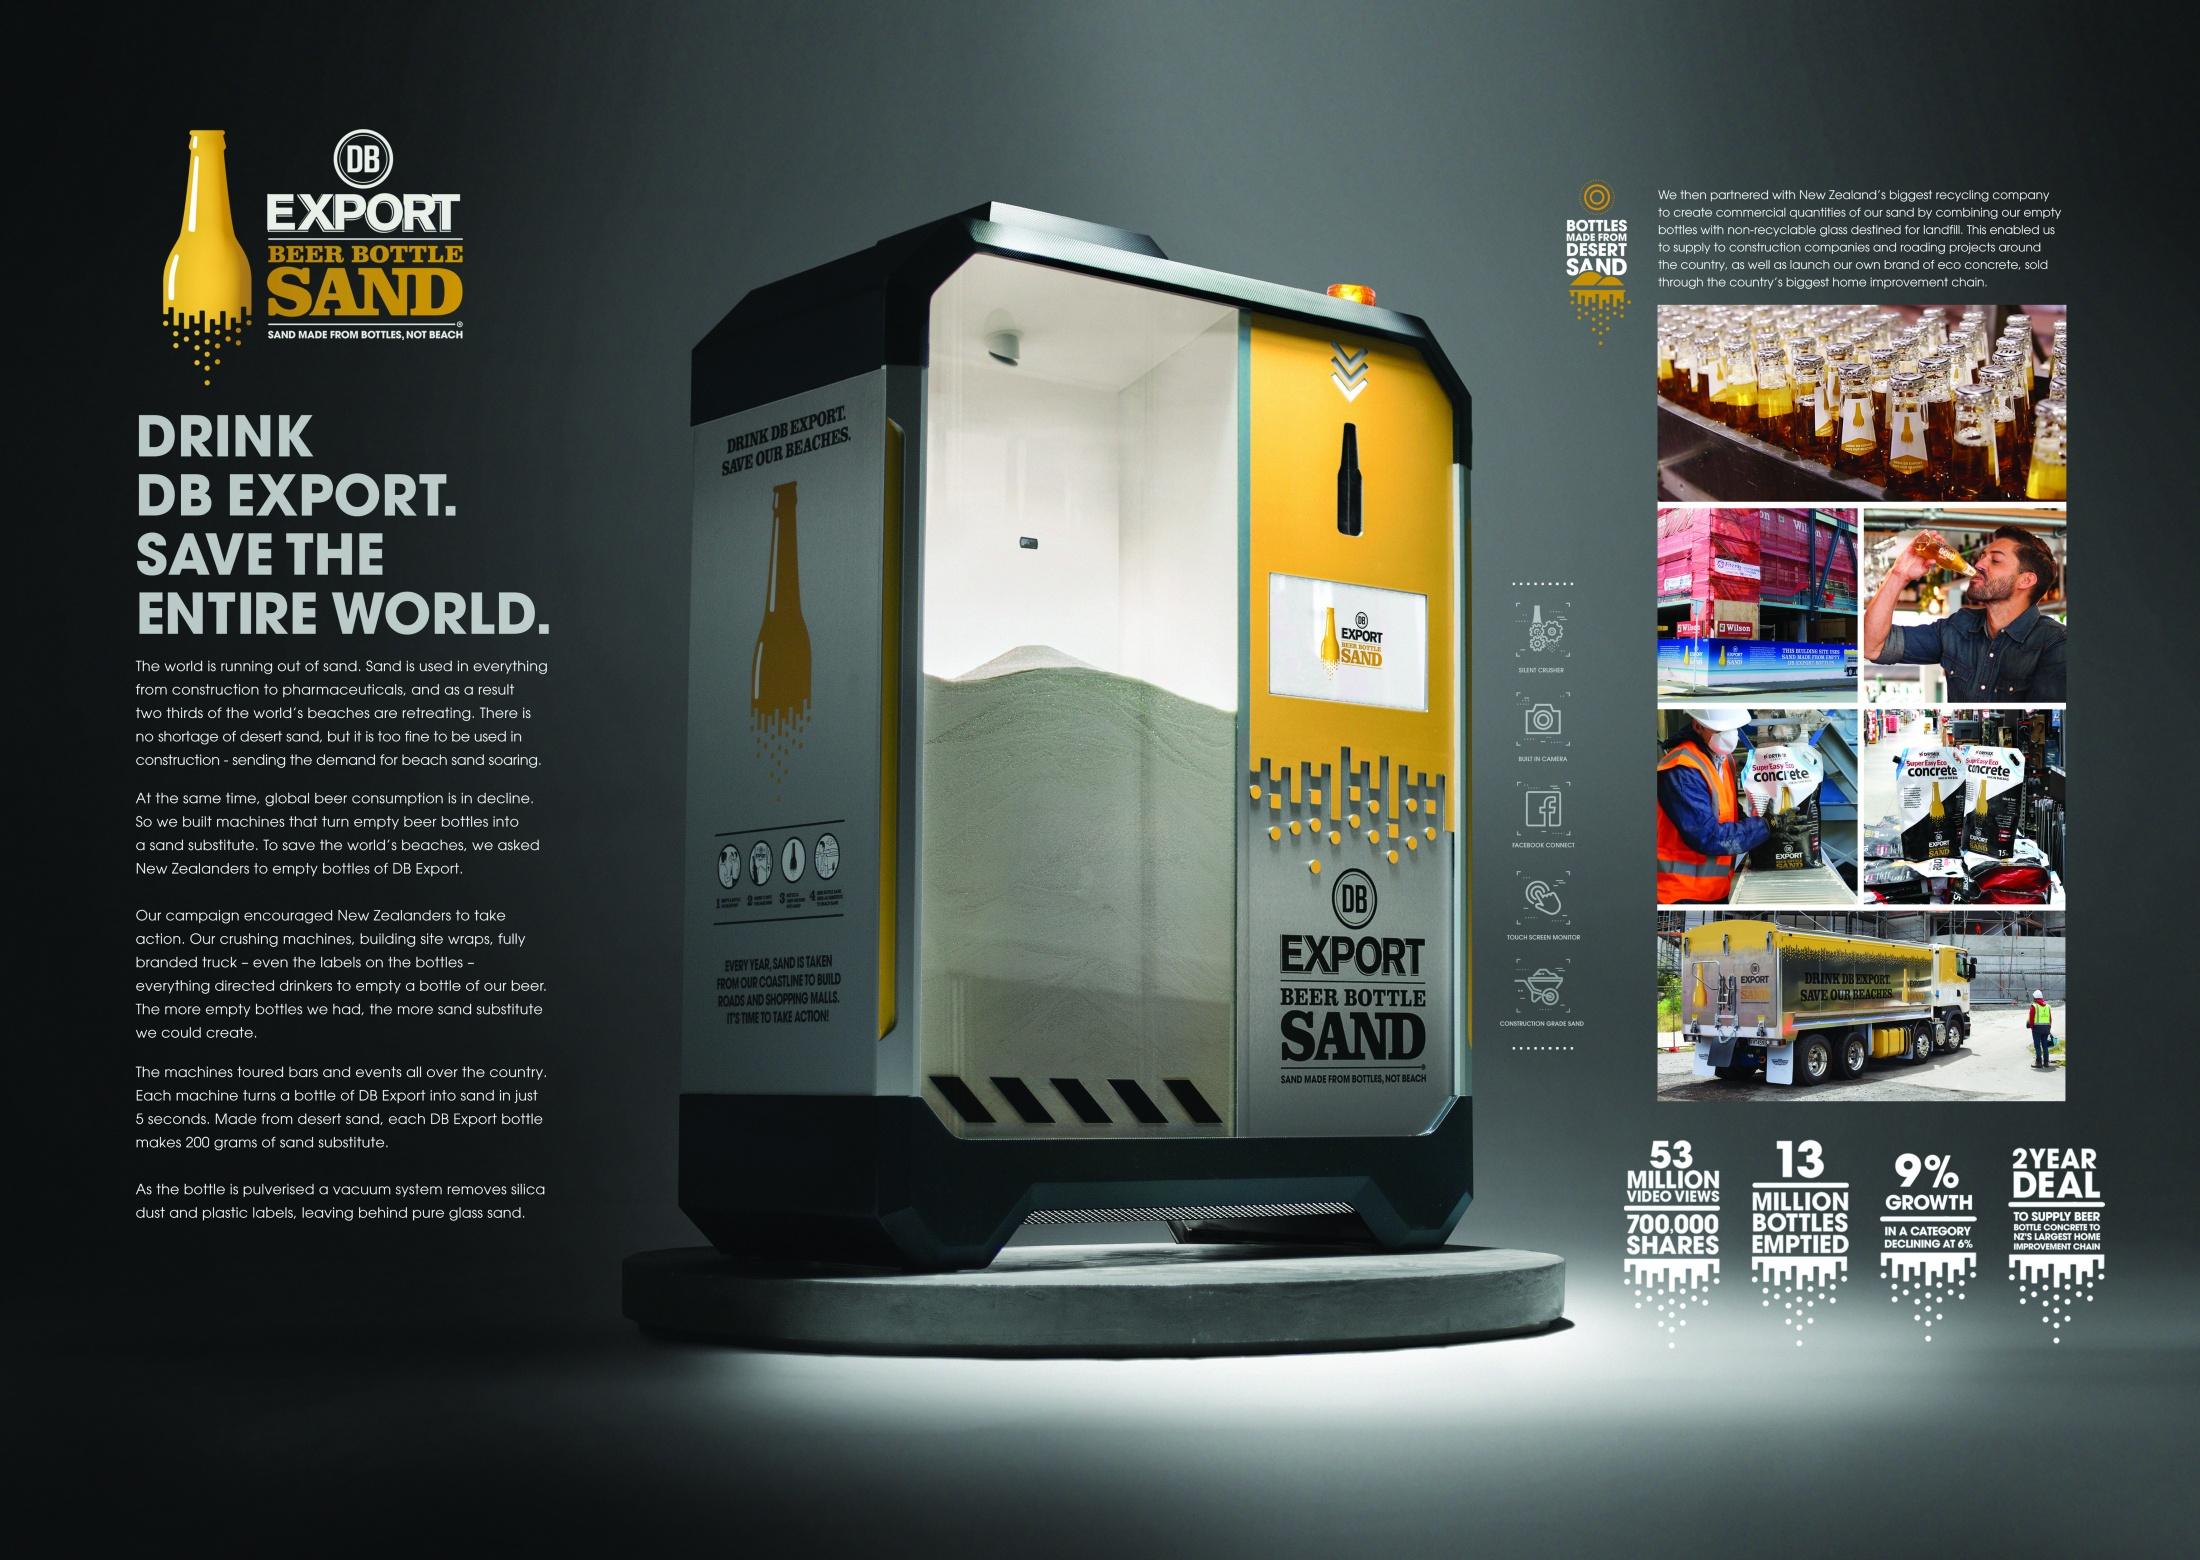 Thumbnail for DB Export Beer Bottle Sand